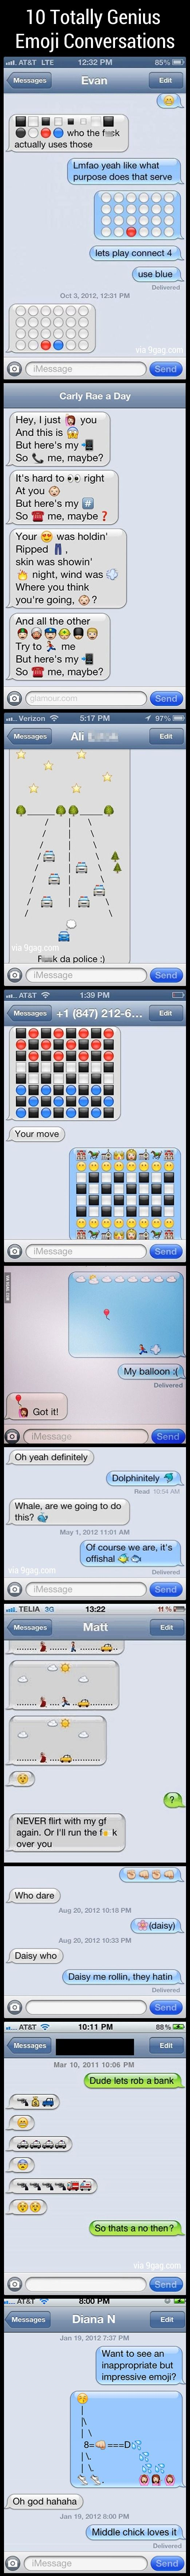 10 Totally Genius Emoji Conversations